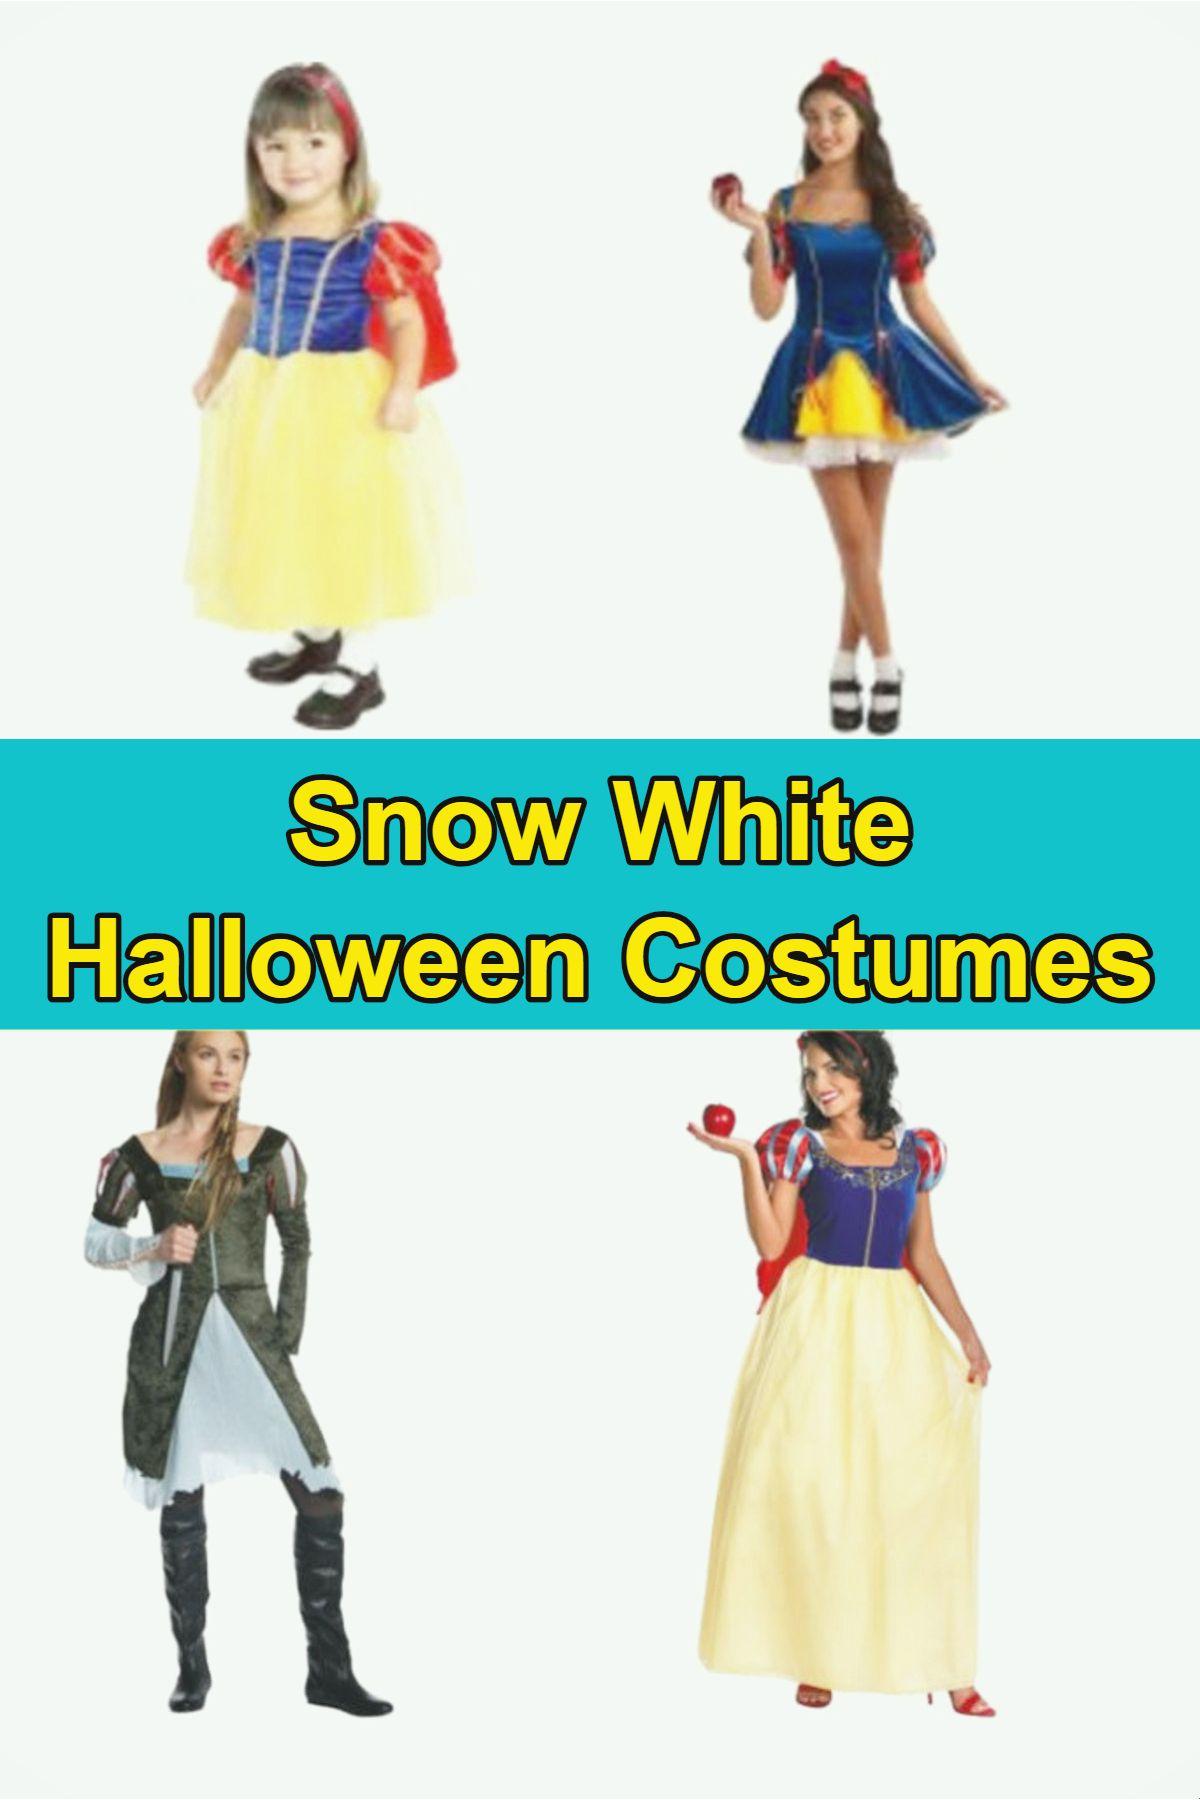 Snow White Halloween Costumes Snow White Halloween Costume a7d7b3fa2fad